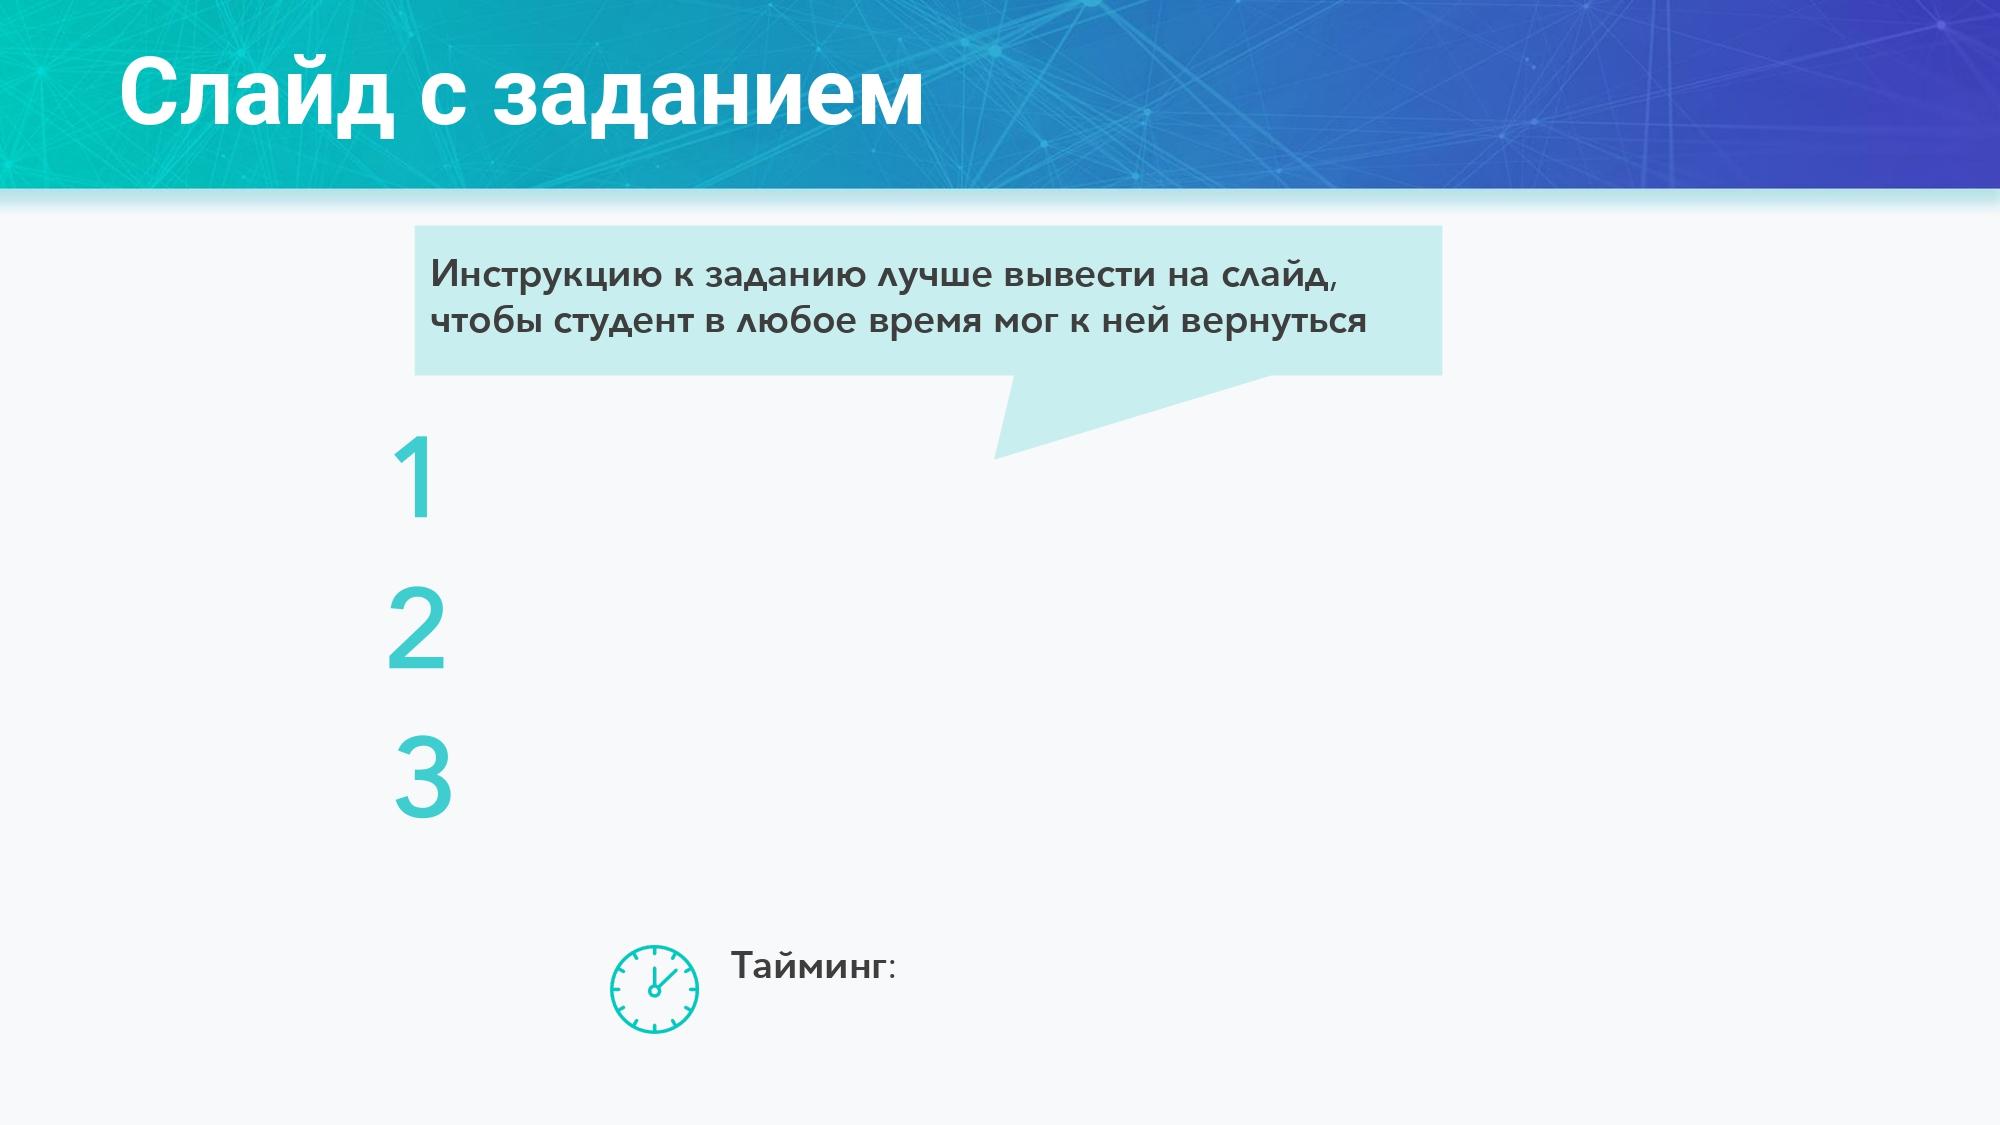 Шаблон_презентации_вебинара_в_новом_дизайне_с_подсказками_page_0010-73510-d3791c.jpg